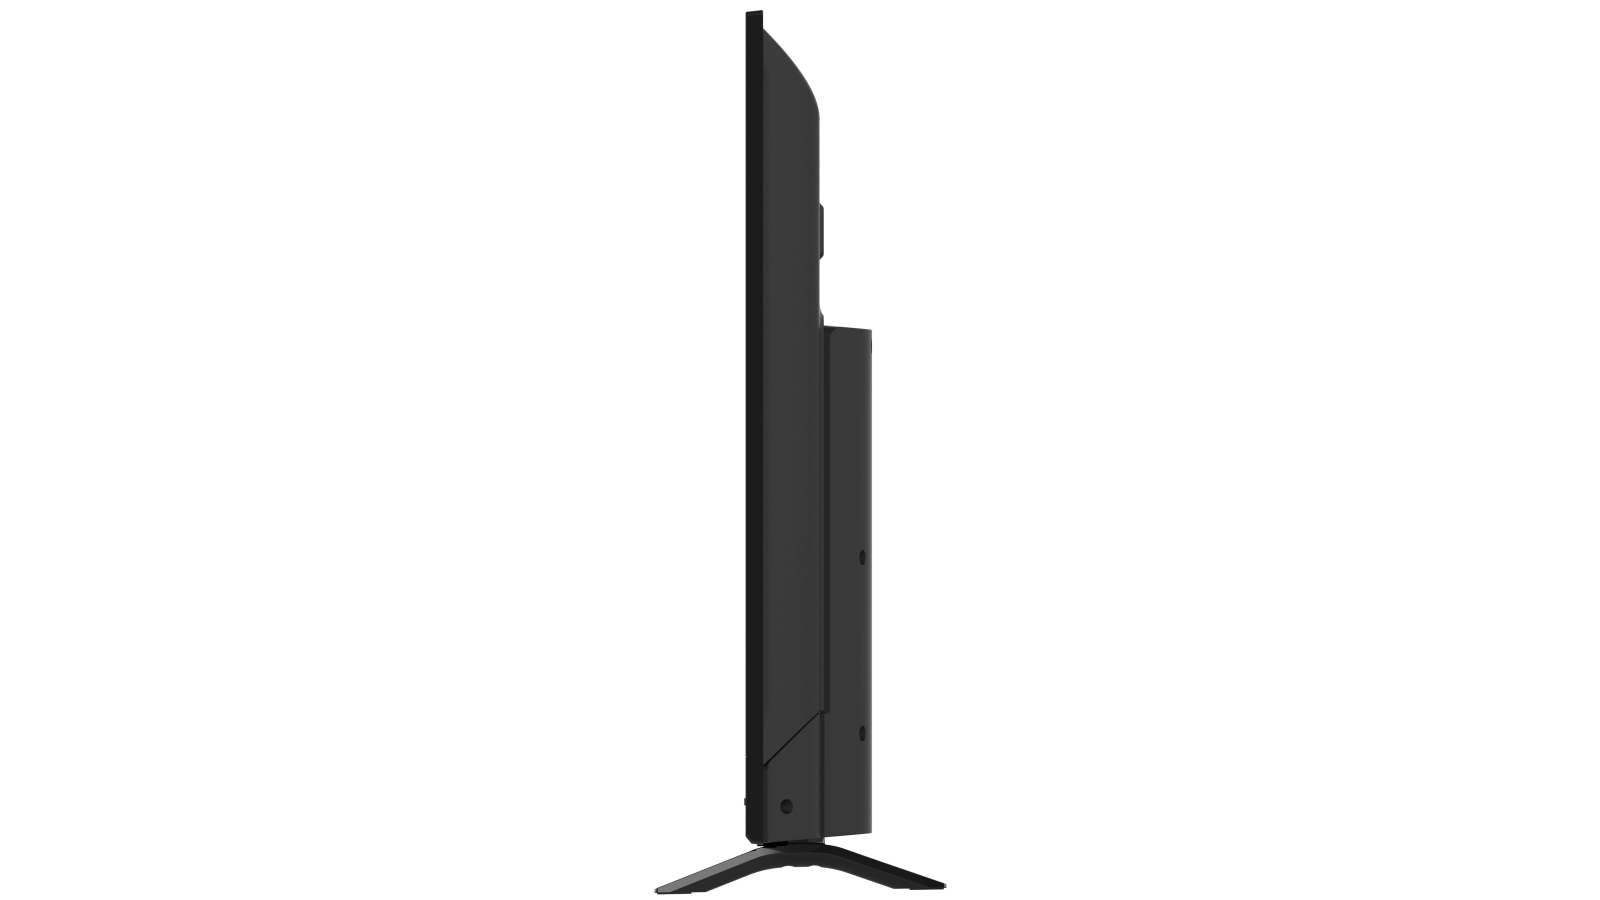 Toshiba 49-inch U47A 4K LED LCD Smart TV